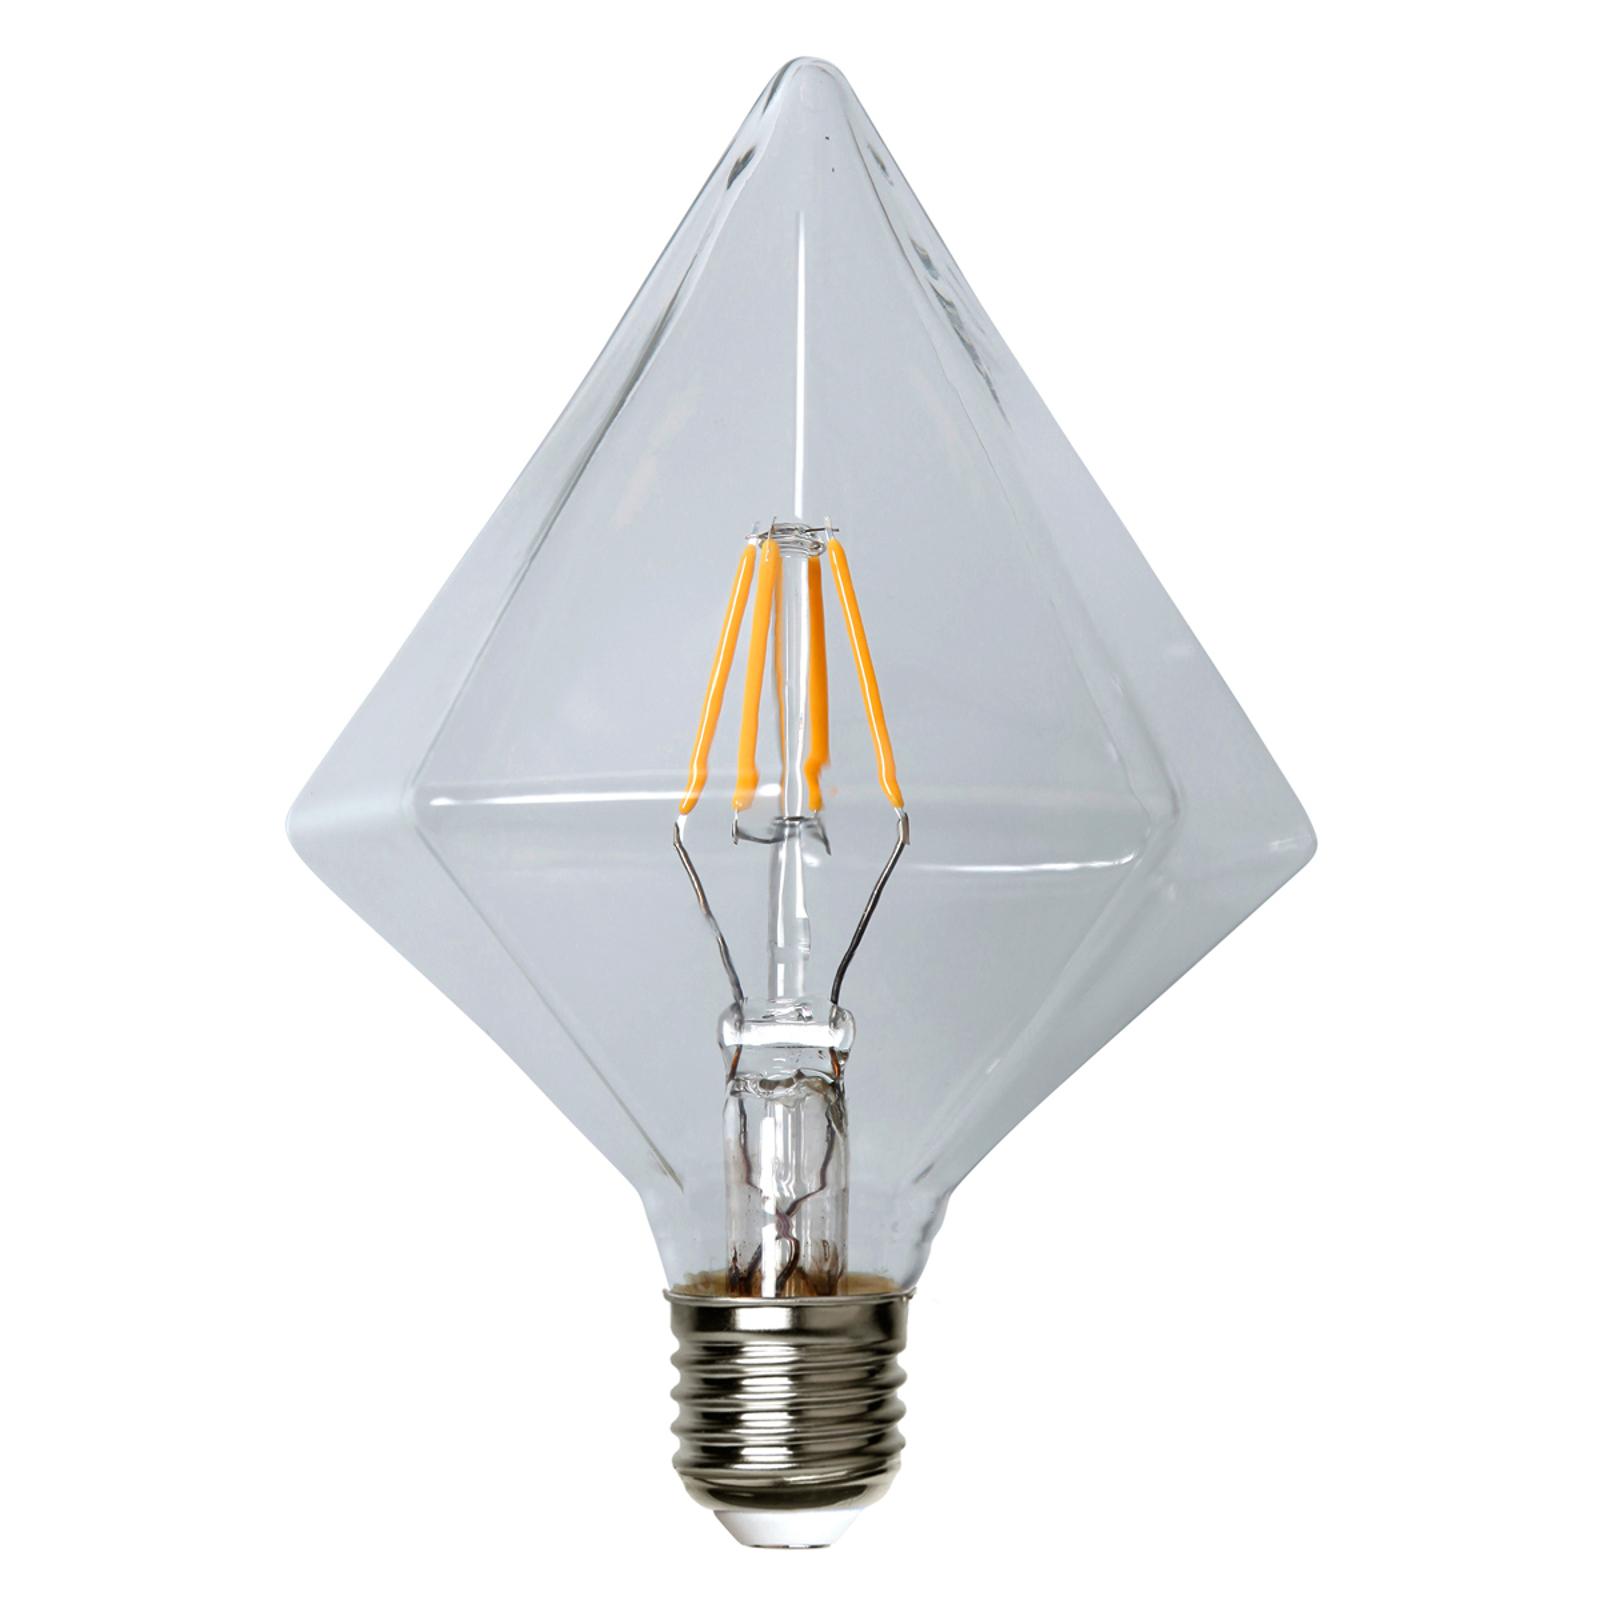 E27 3,2W 827 LED-Lampe, diamantenförmig 16,5 cm